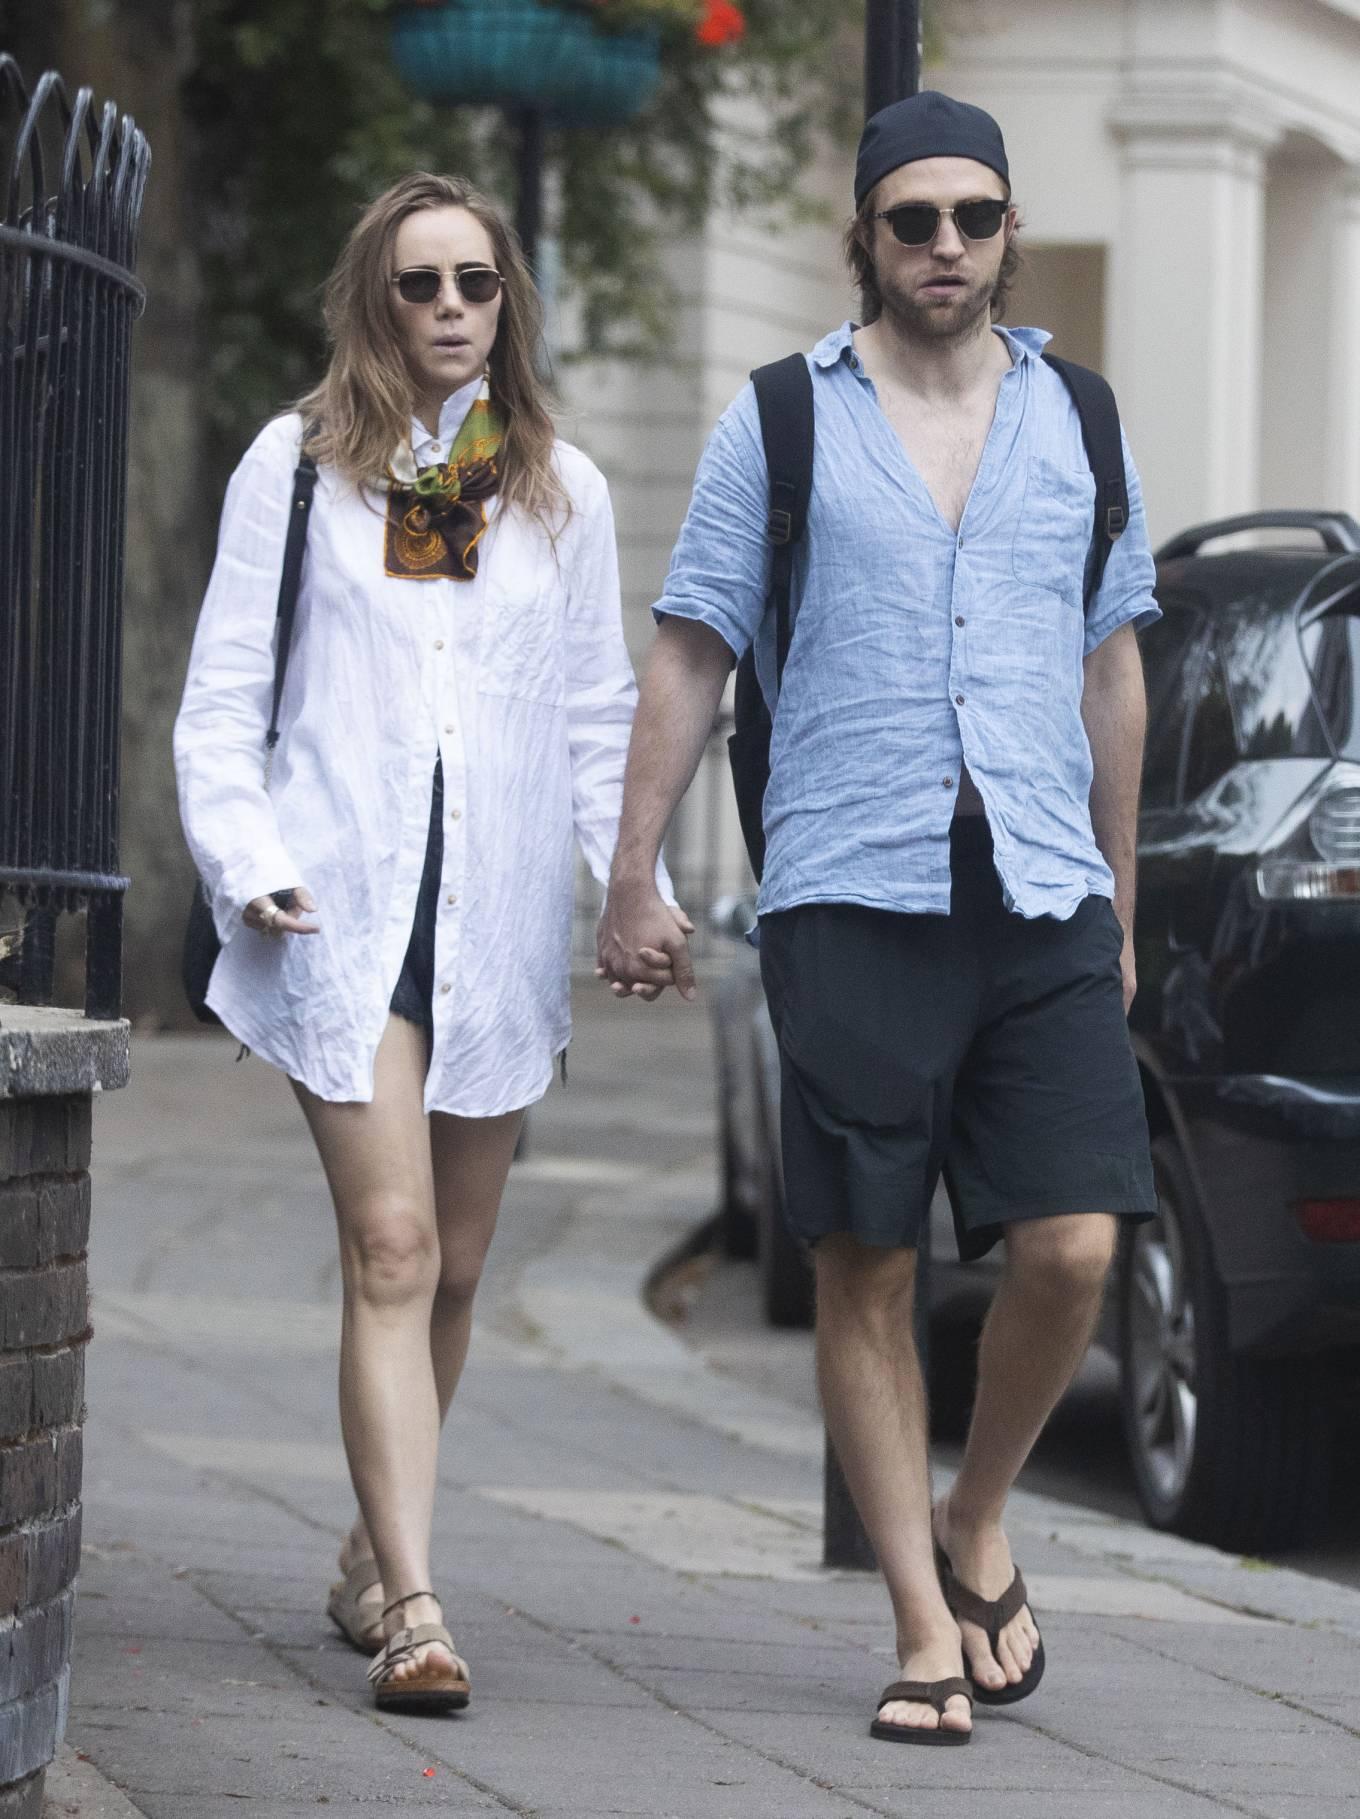 Suki Waterhouse 2020 : Suki Waterhouse and Robert Pattinson – Out in London-09